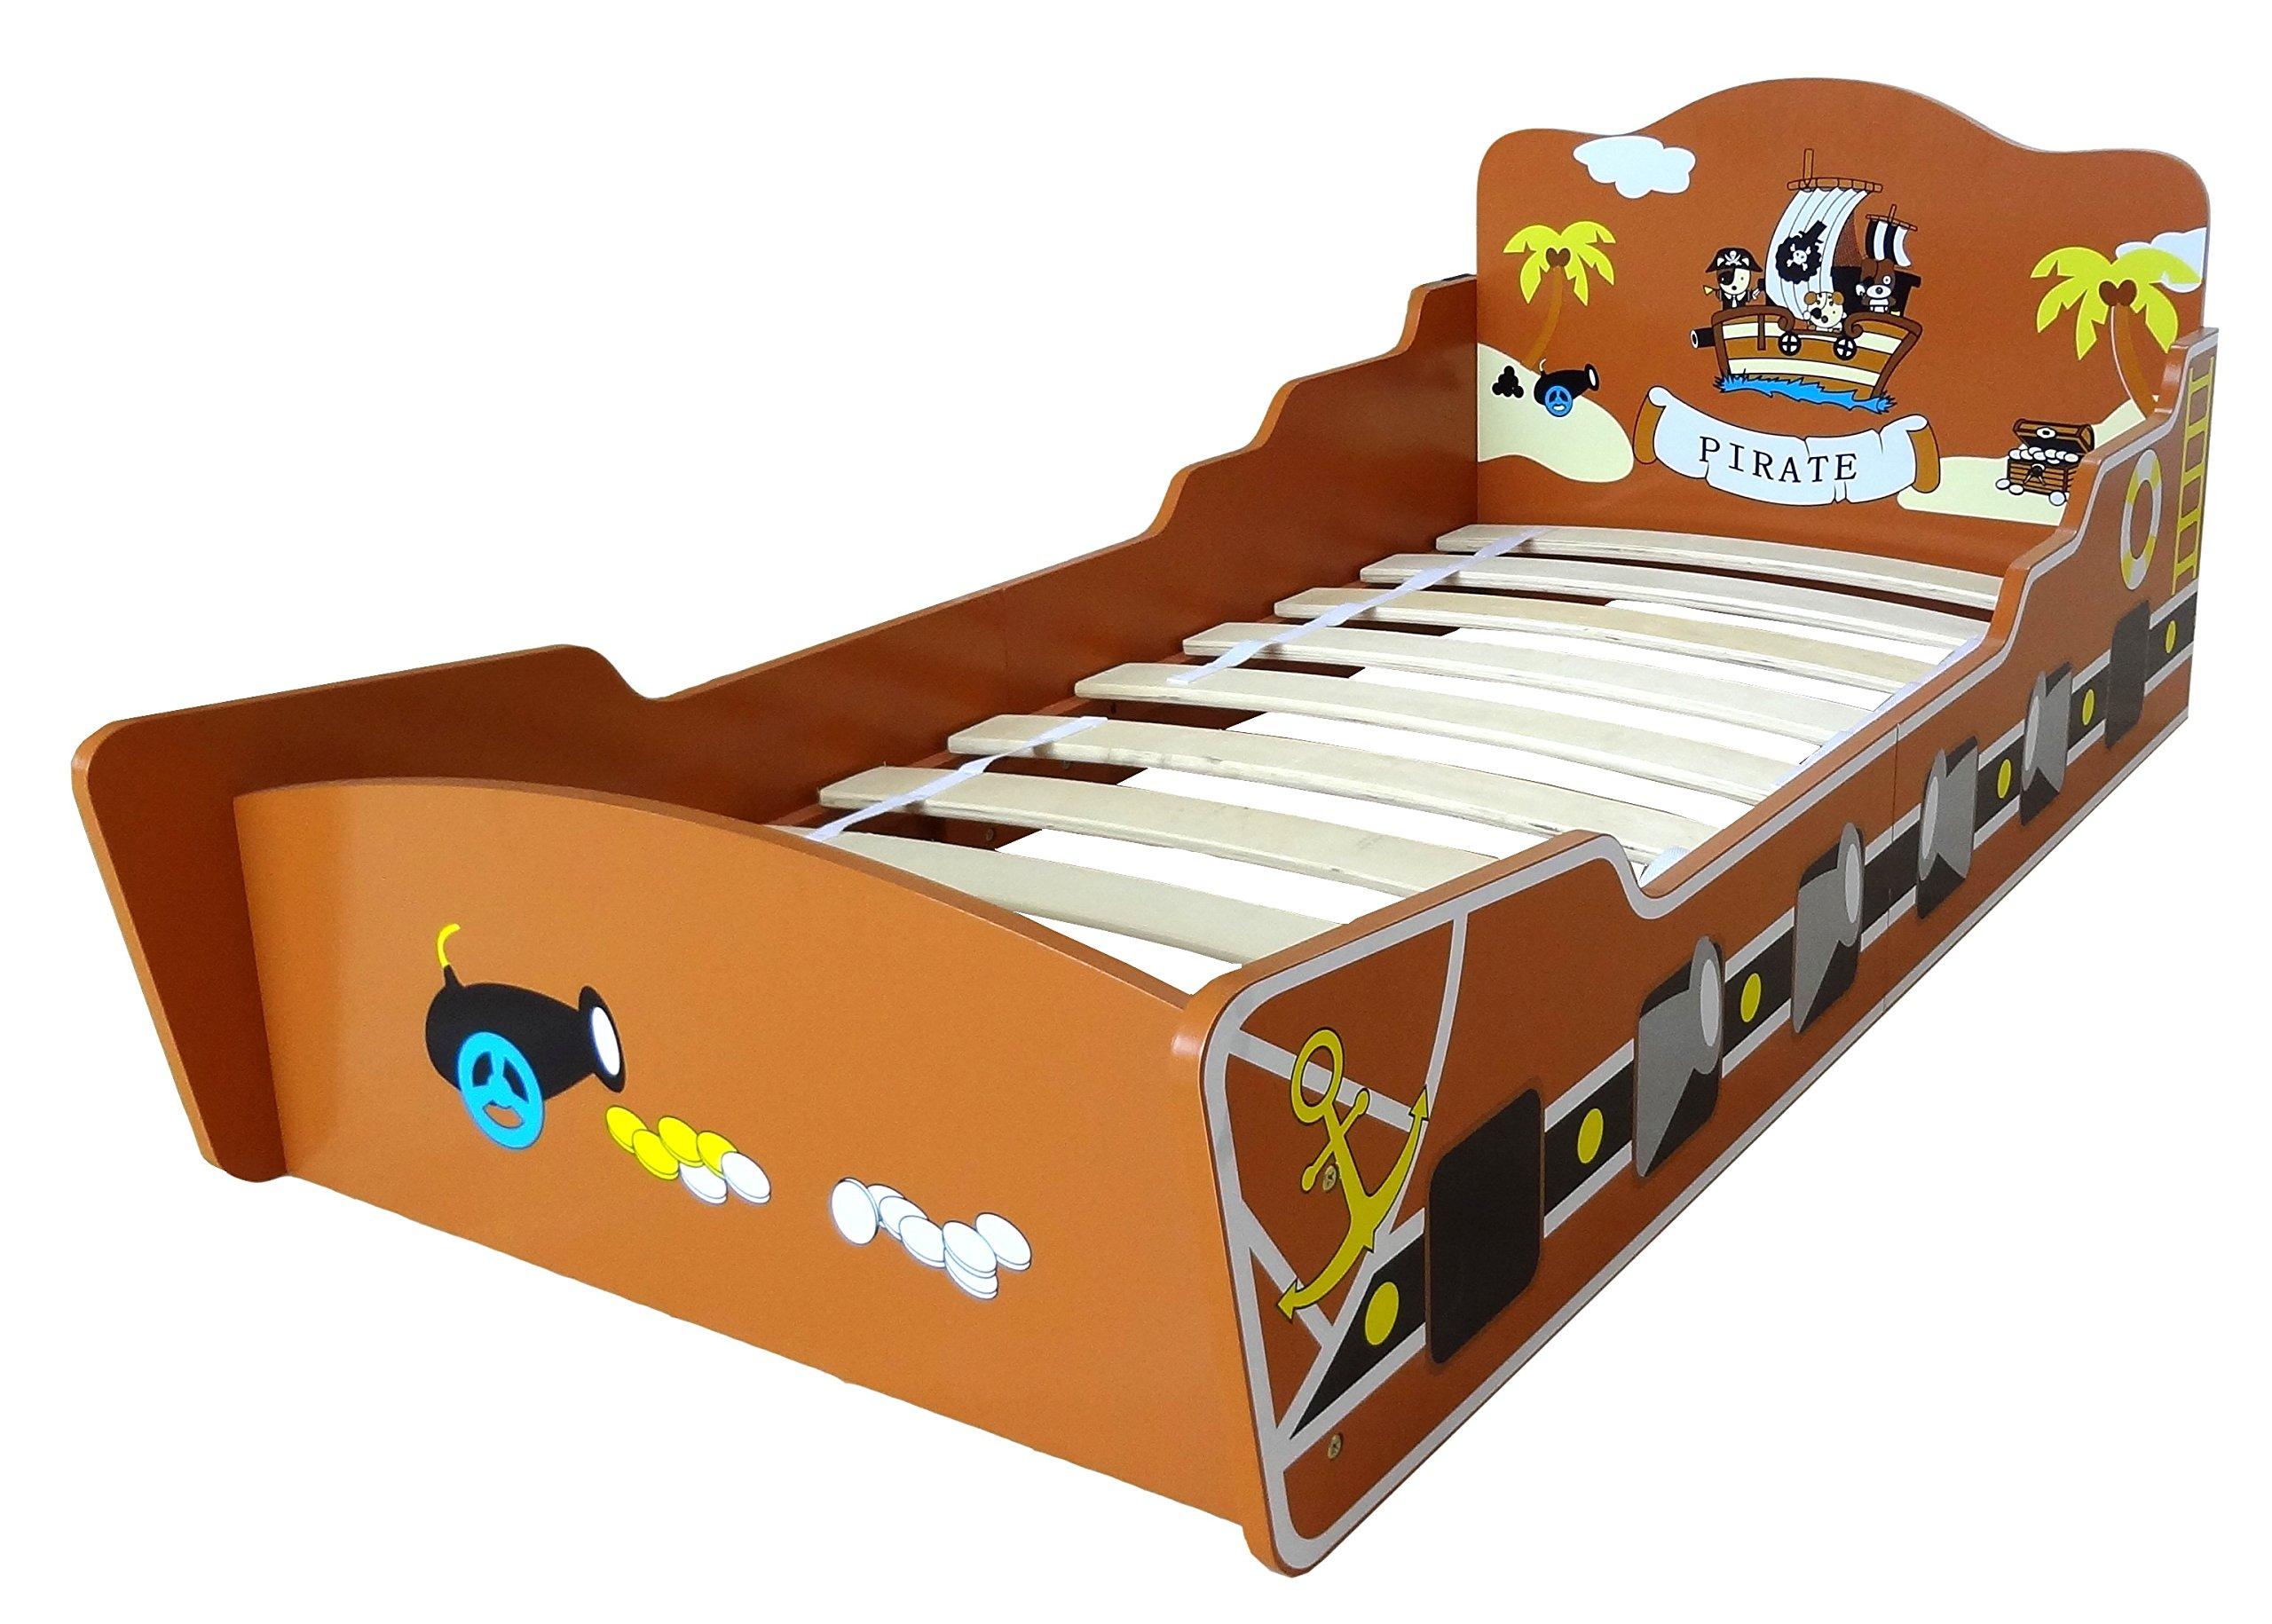 Kiddi Style Cama Infantil Madera de Piratas - Madera per ninos product image